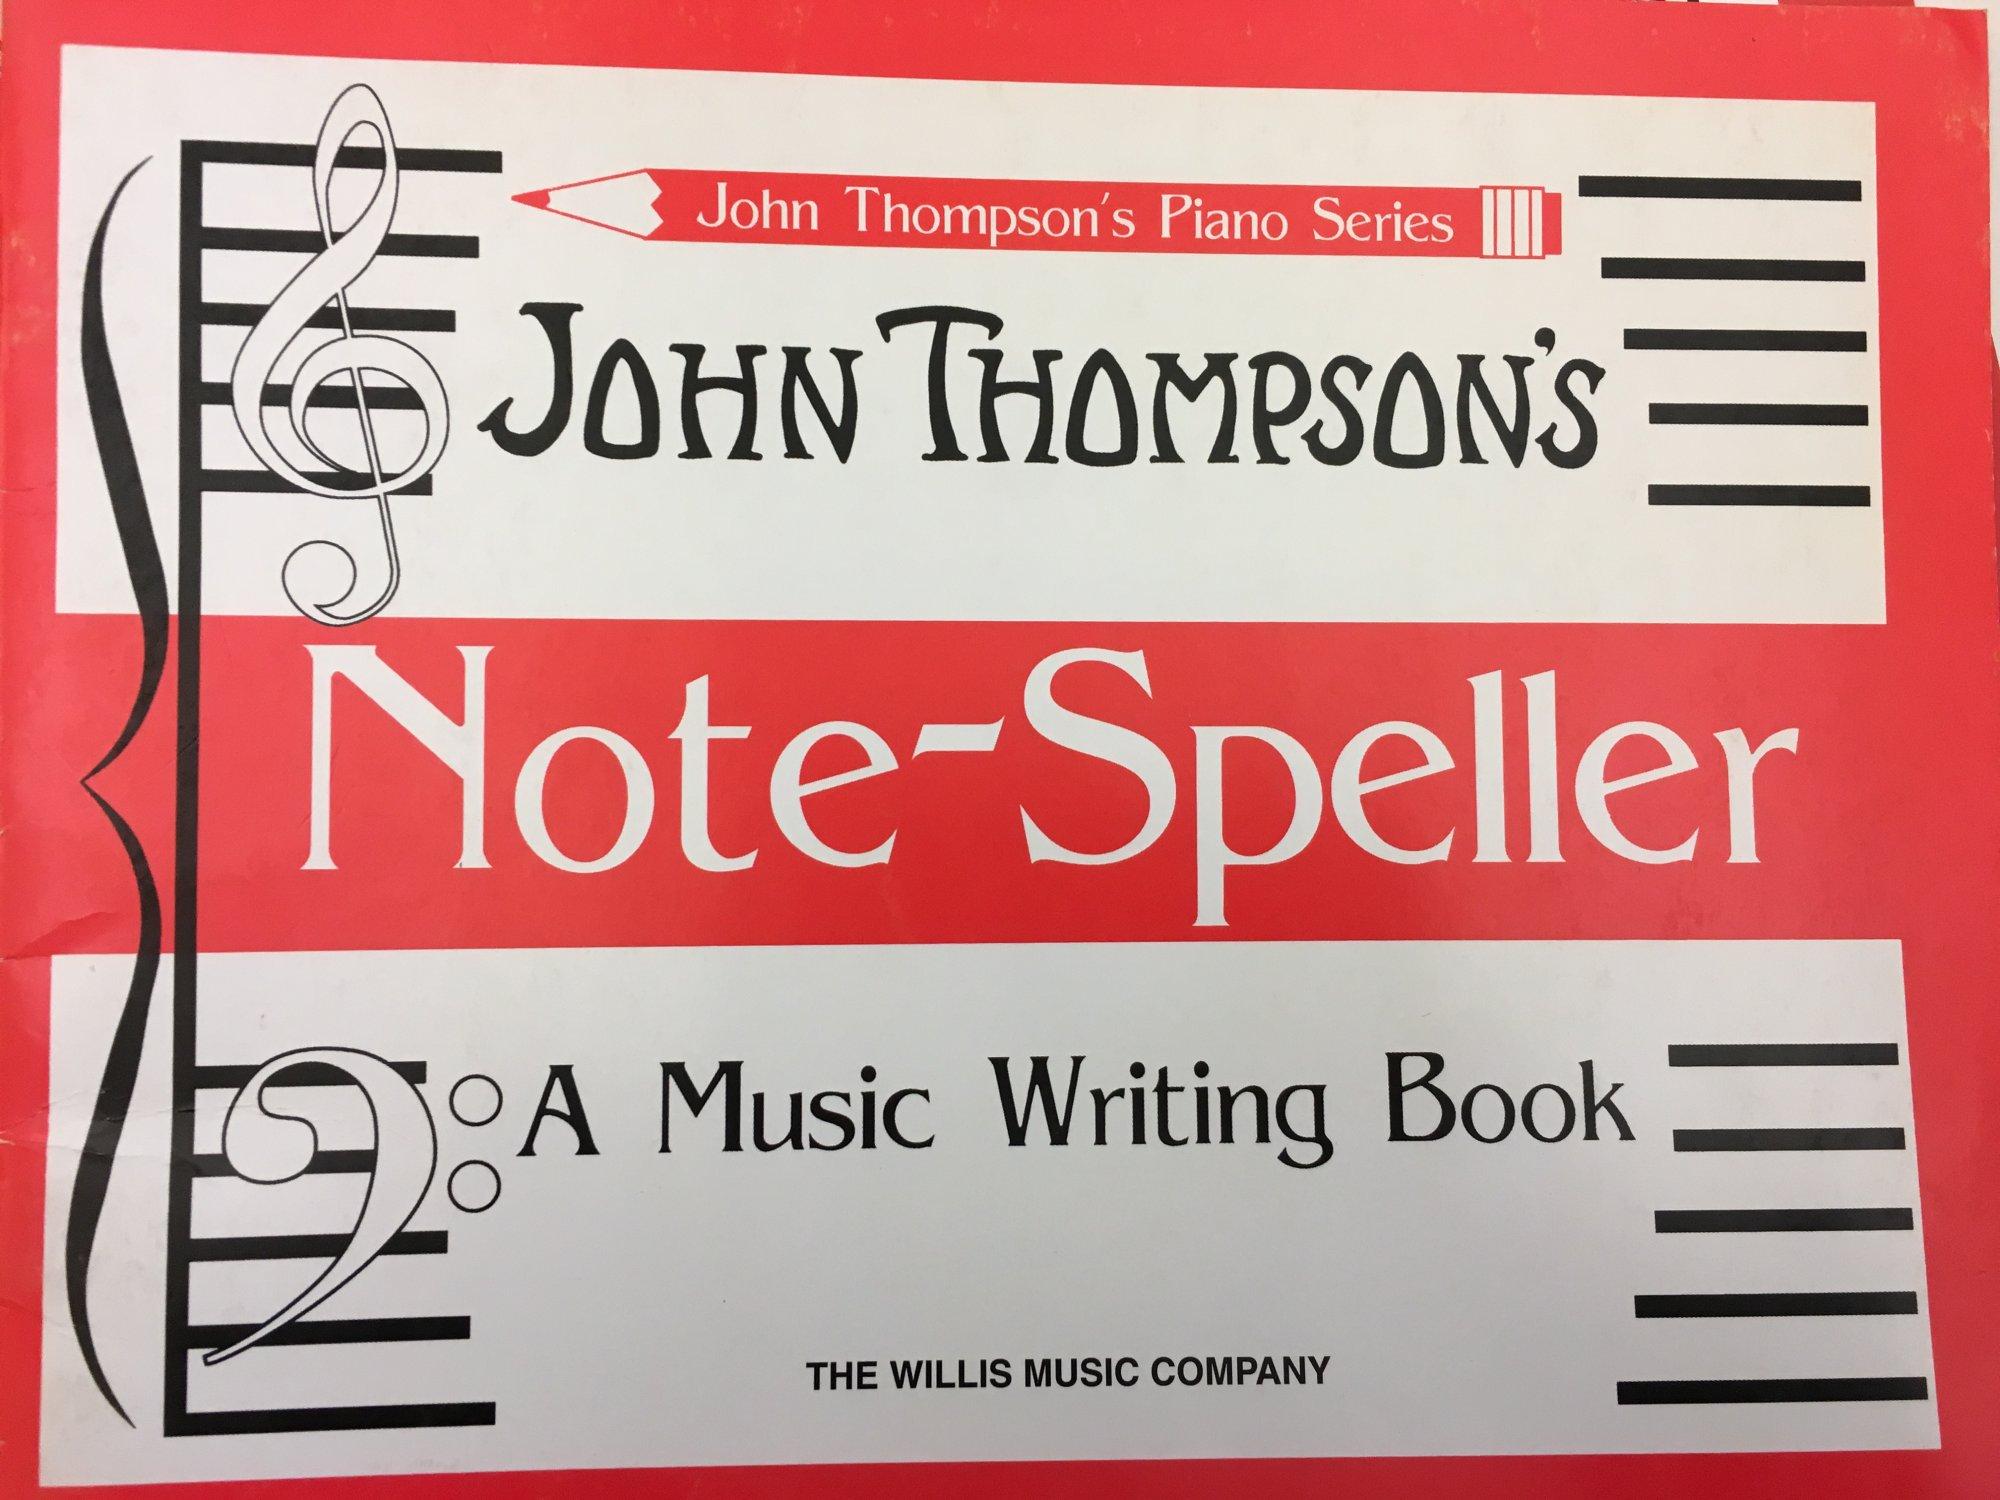 John Thompson's Piano Series Note-Speller